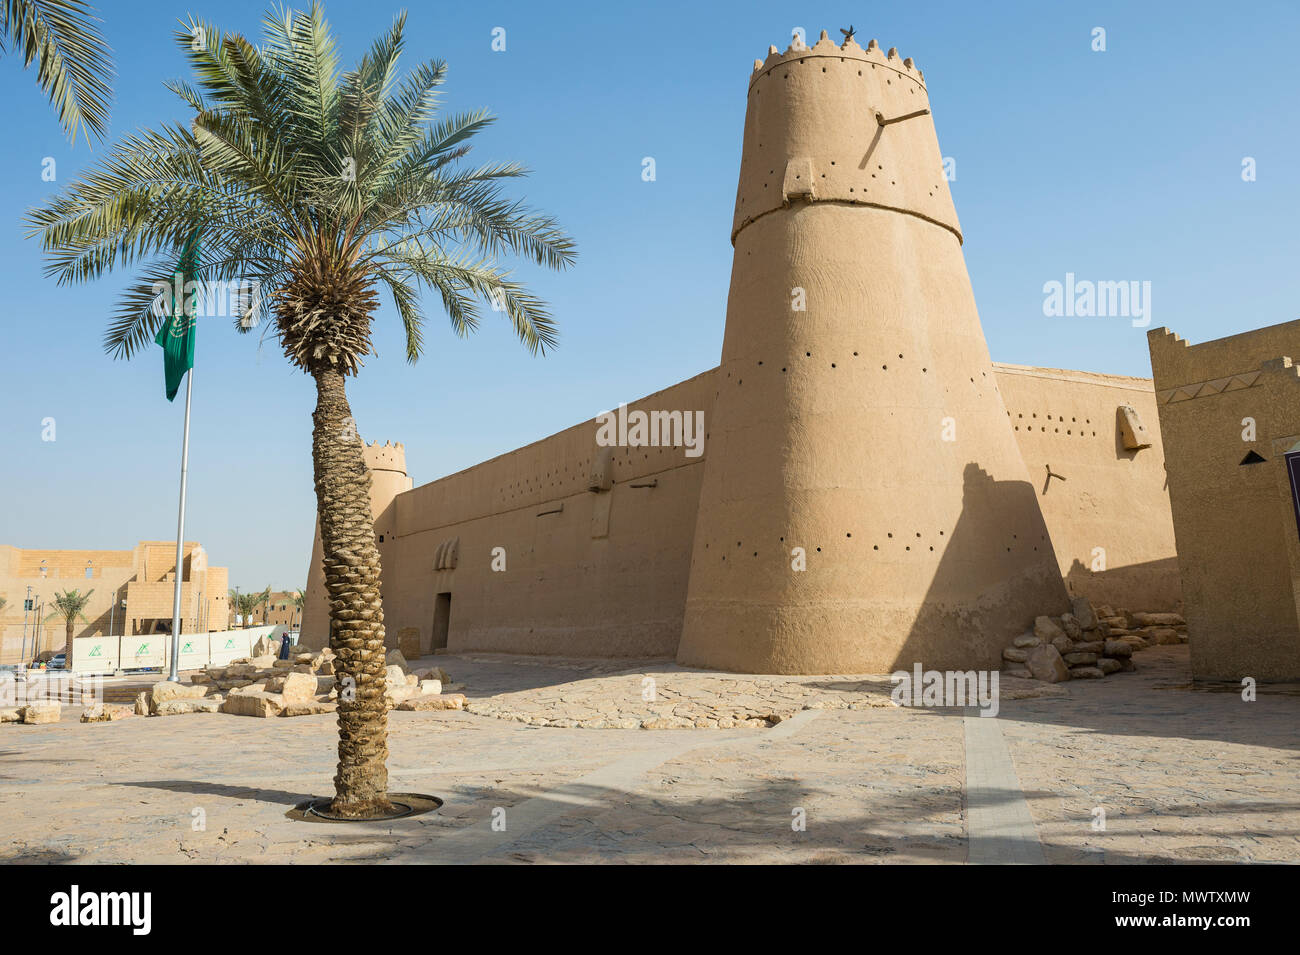 Masmak Fort, en Riad, Arabia Saudita, Oriente Medio Imagen De Stock